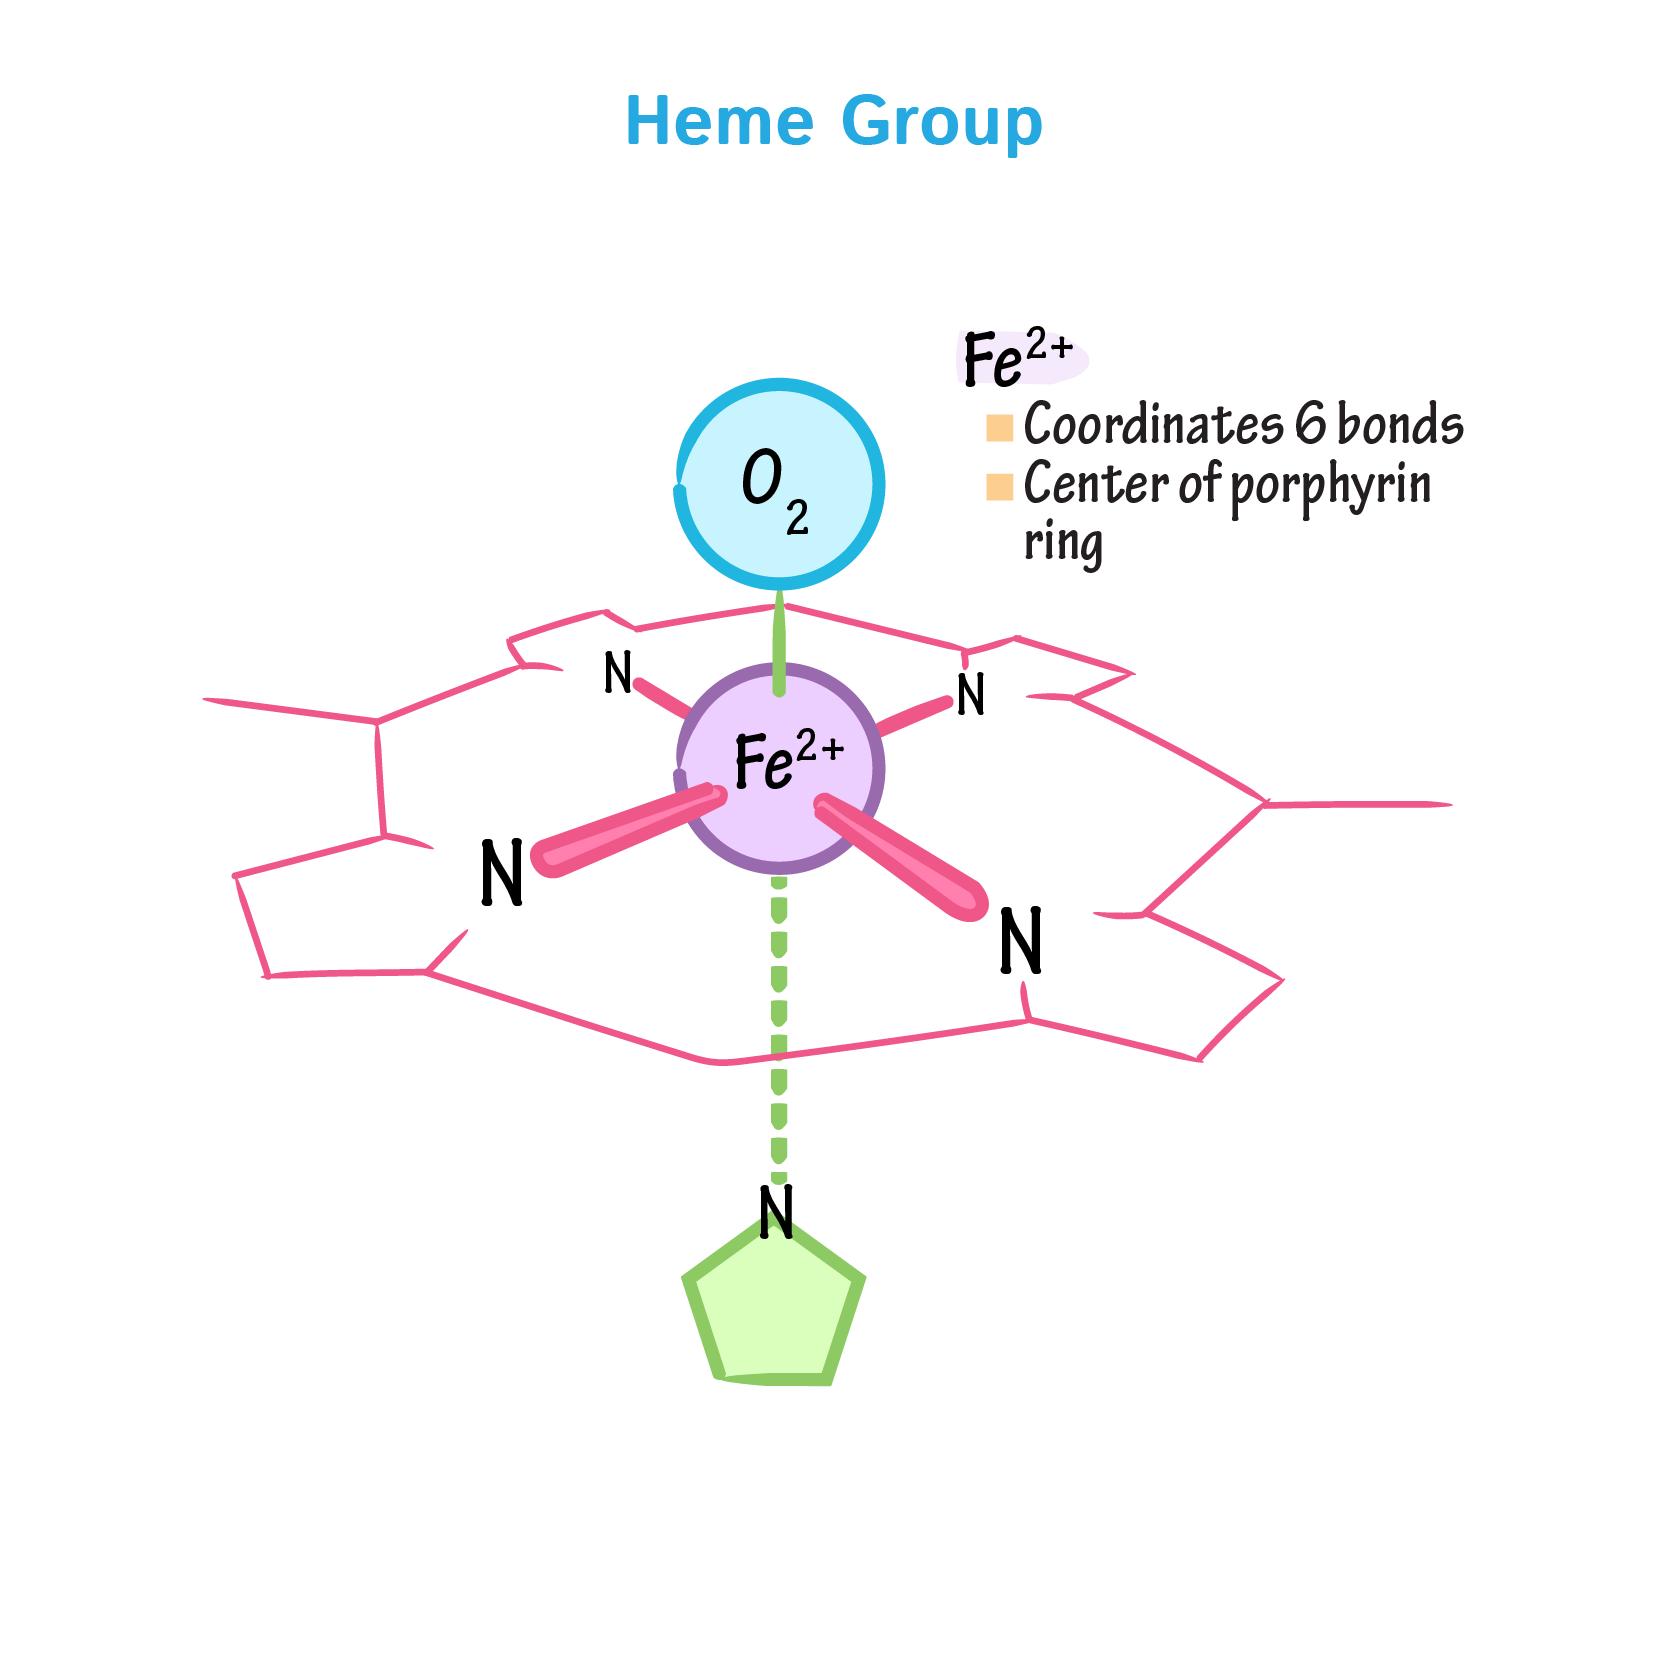 hight resolution of biochemistry glossary hemoglobin myoglobin 1 heme group draw it to know it